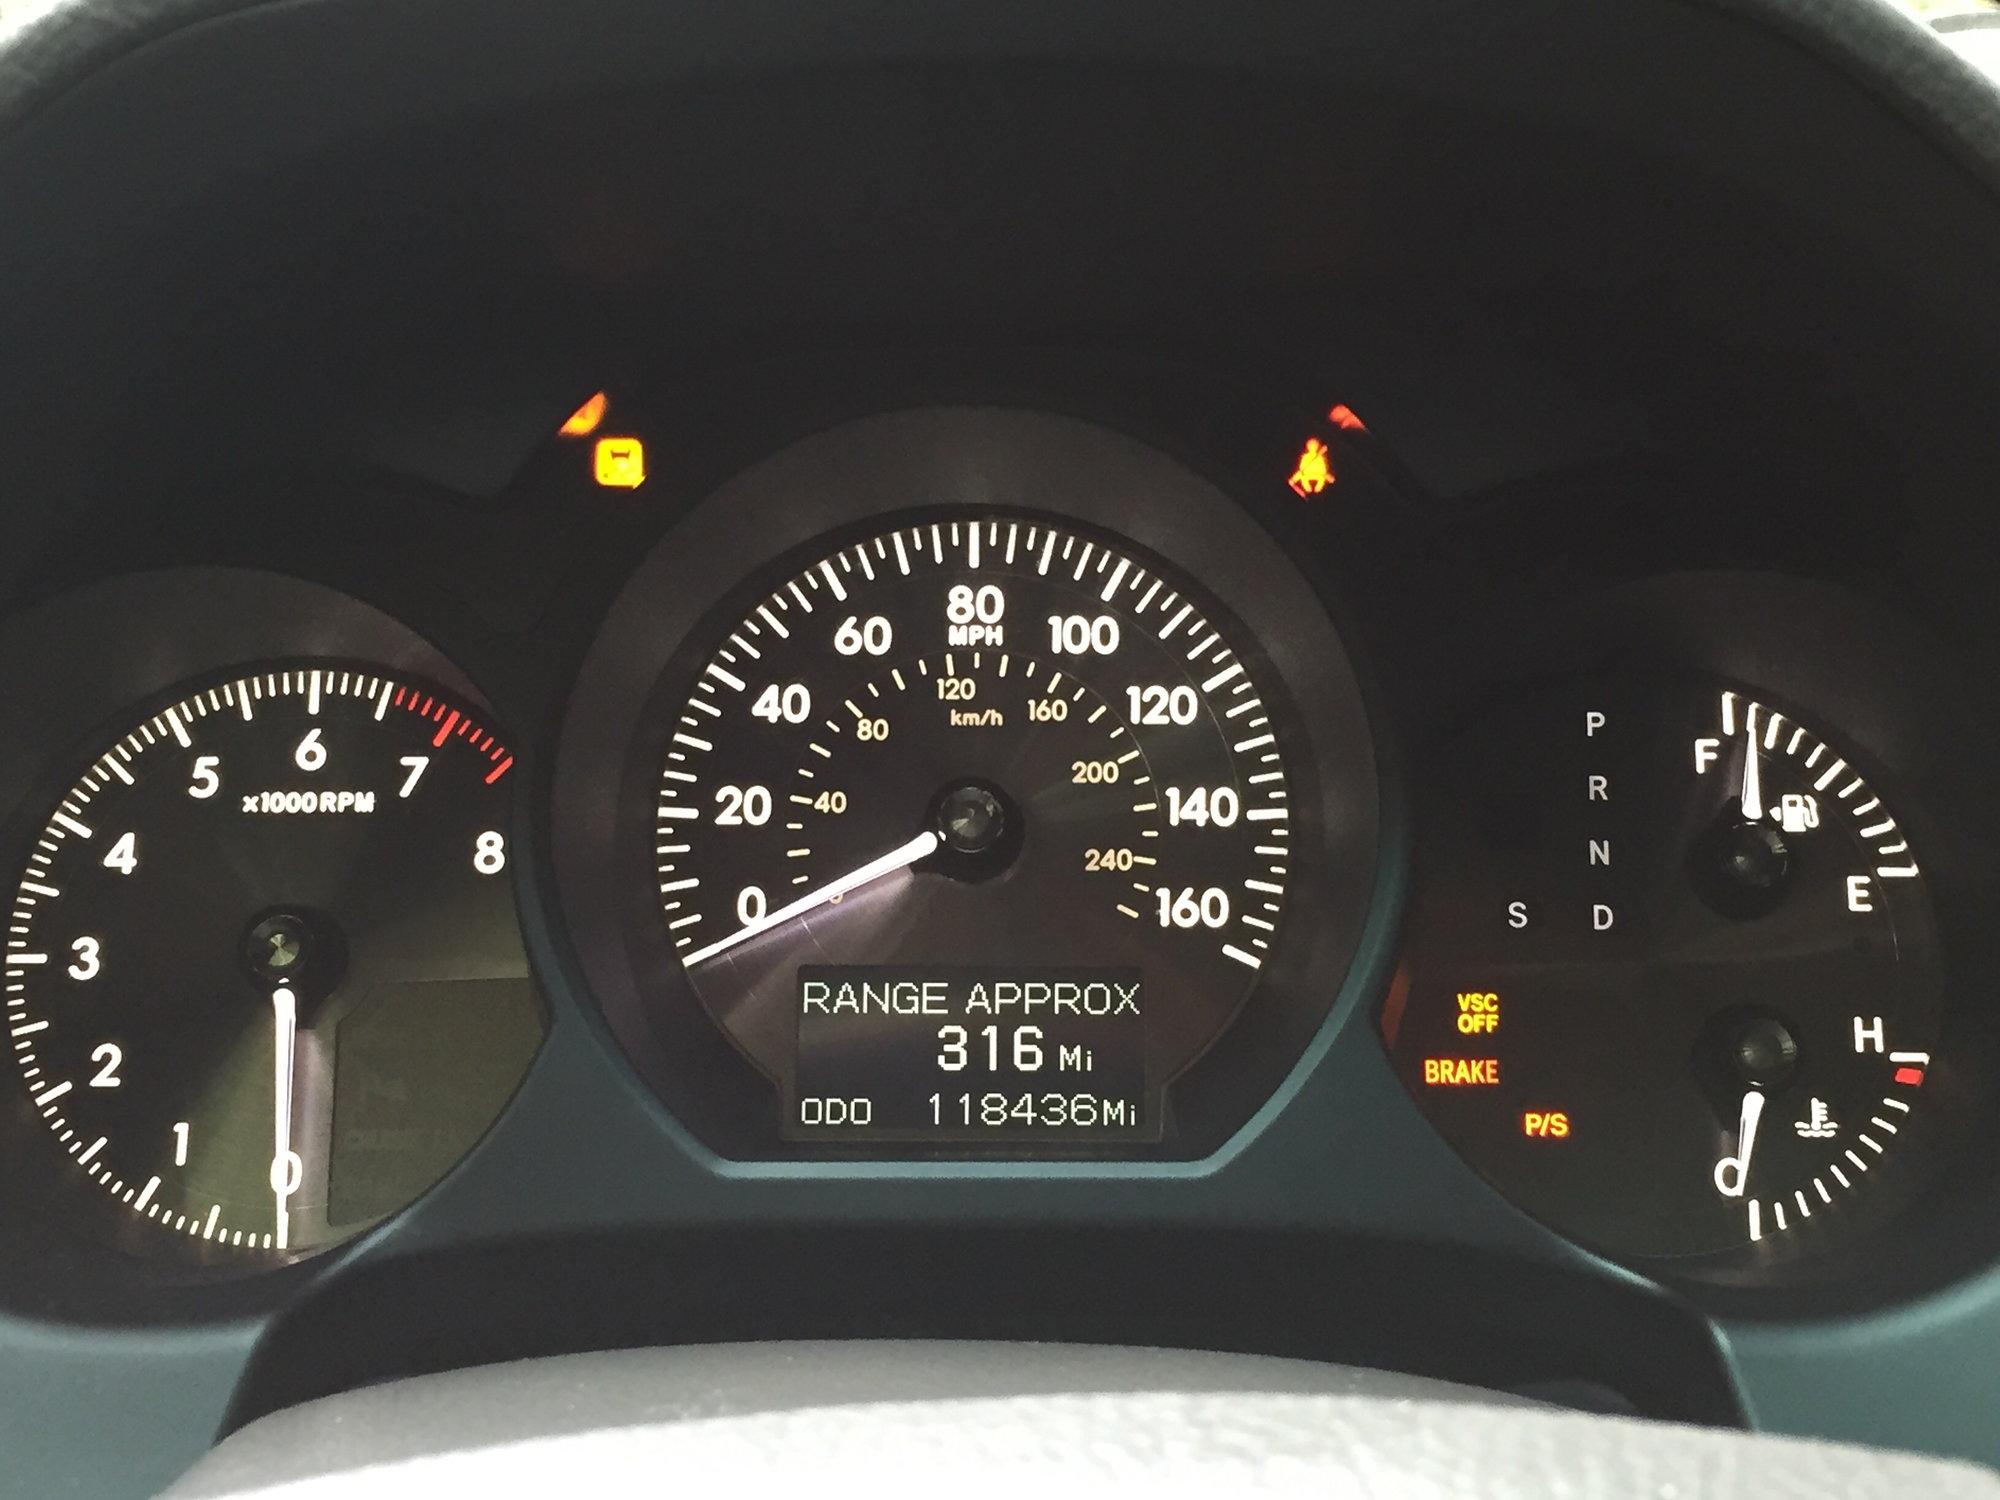 Check VSC & car is not starting on 2007 Lexus GS 350